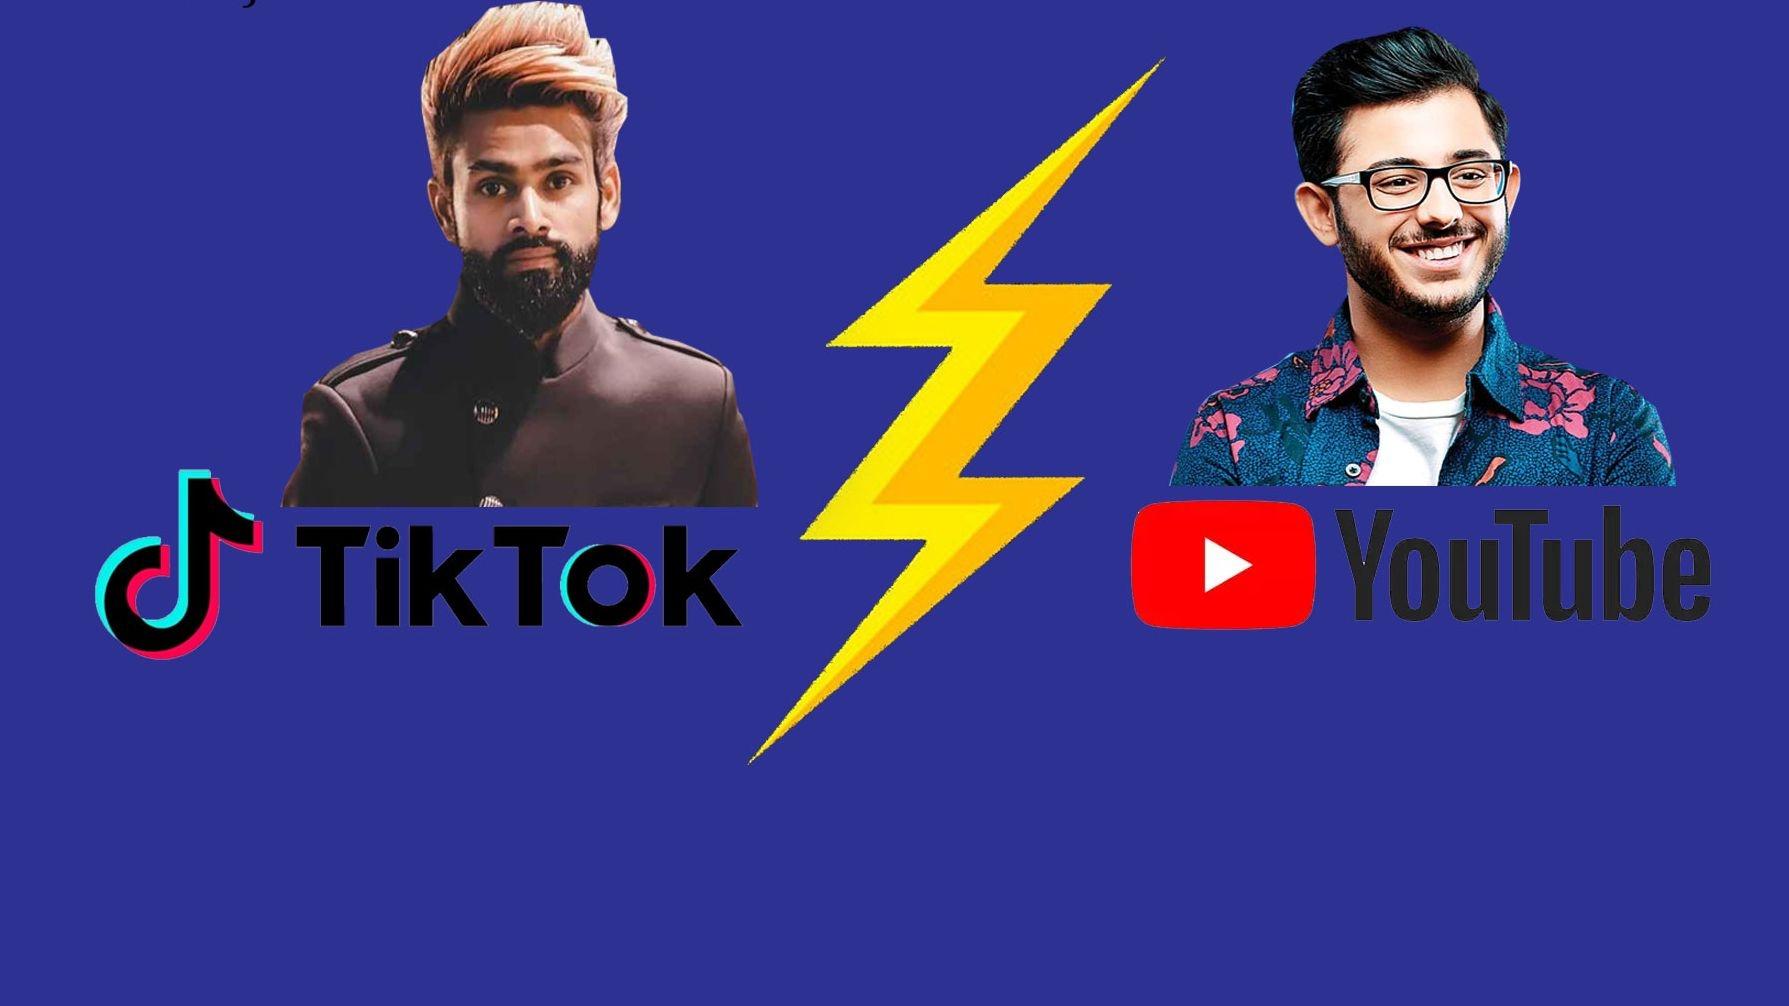 #YouTubeVsTikTok: Row Between CarryMinati-Amir Siddiqui, Explained